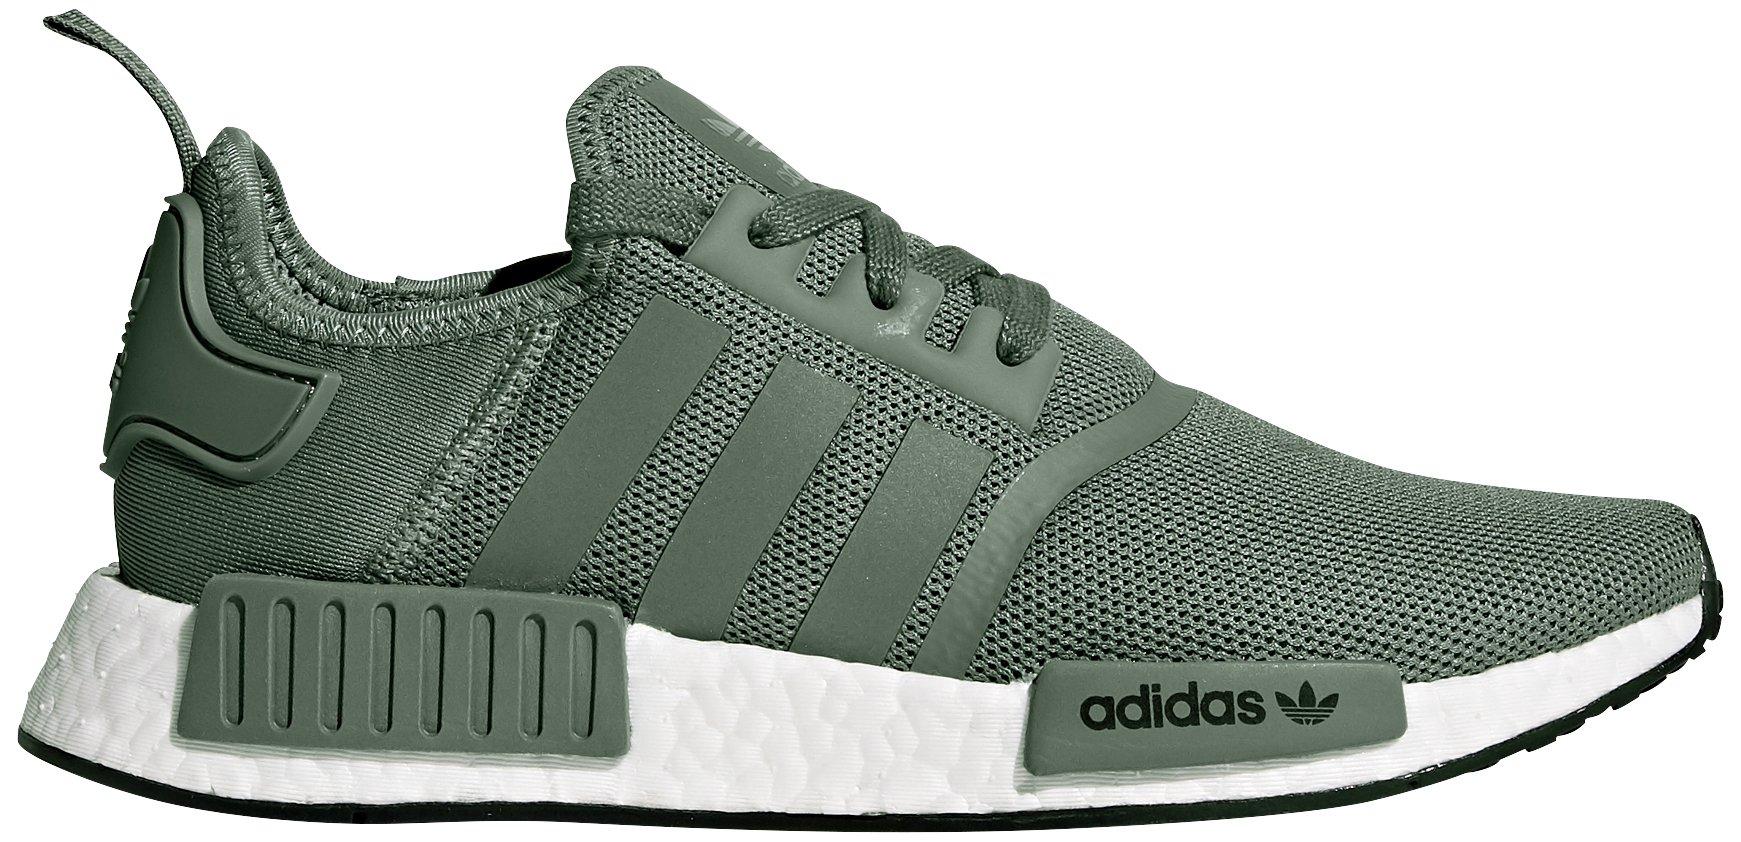 adidas Originals Men's NMD_R1 Running Shoe, Trace Green/Turbo, 9 M US